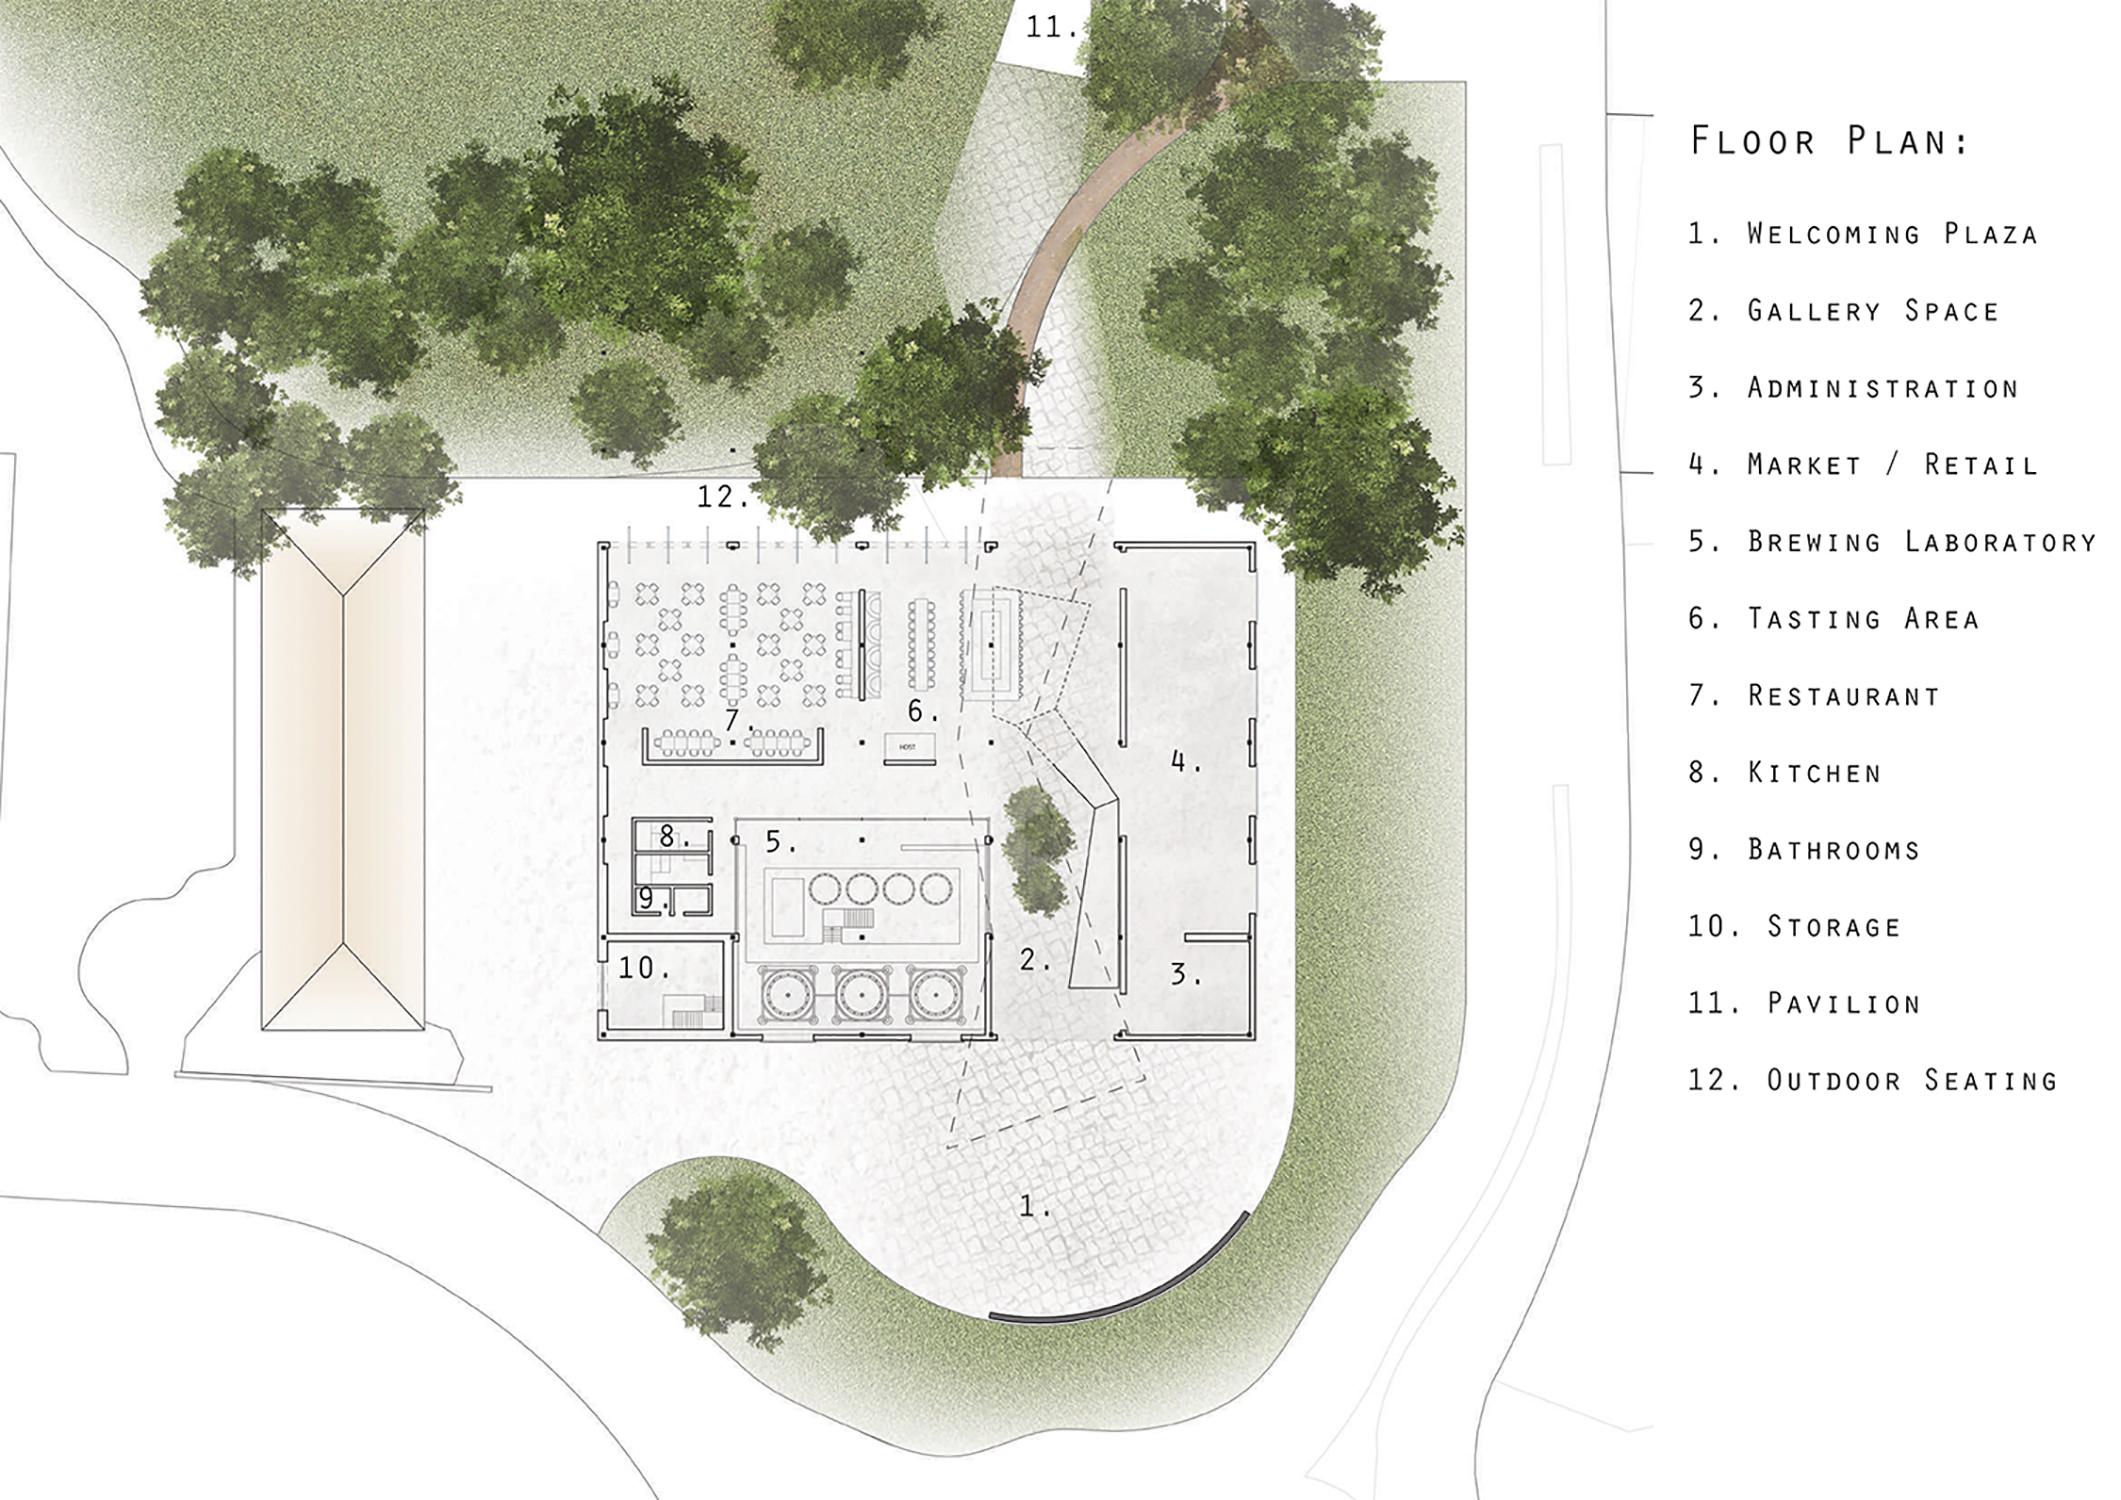 03 Floor Plan.jpg